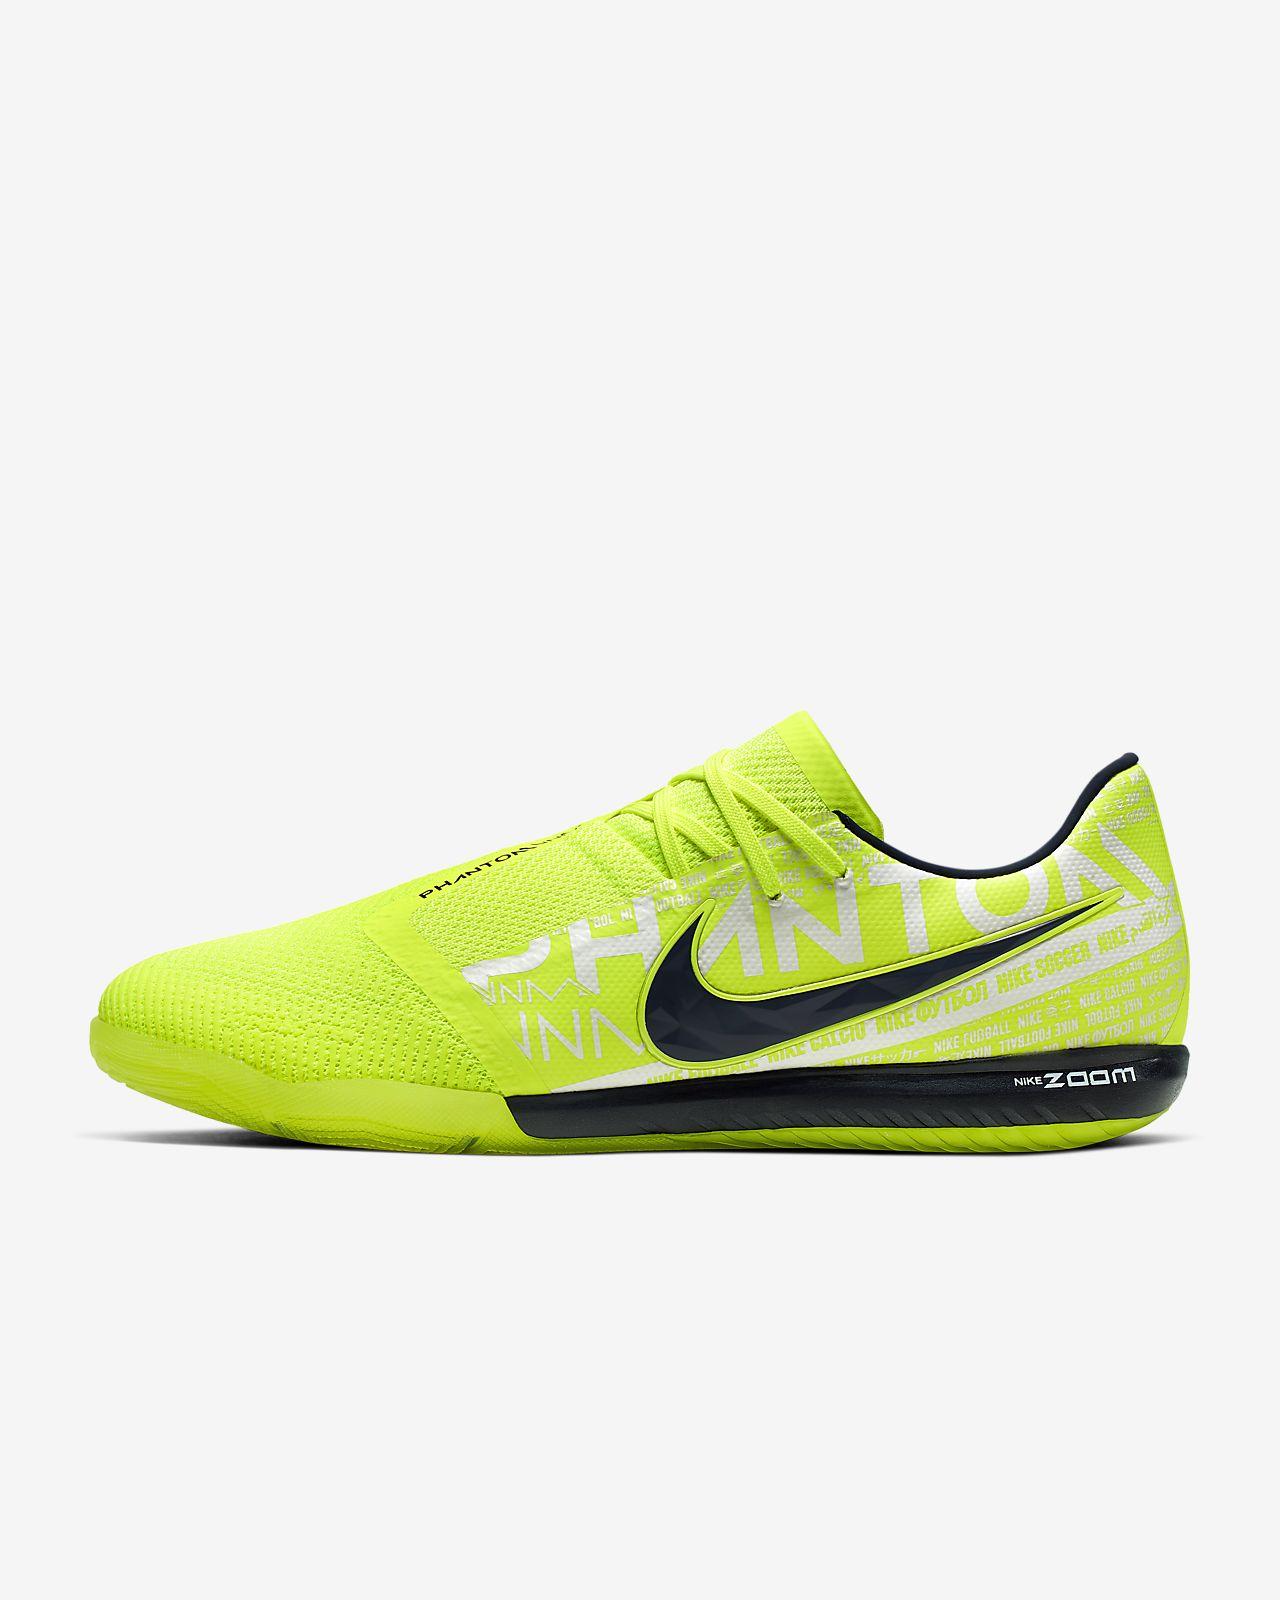 buying now factory authentic usa cheap sale Nike Zoom Phantom Venom Pro IC Indoor/Court Football Shoe